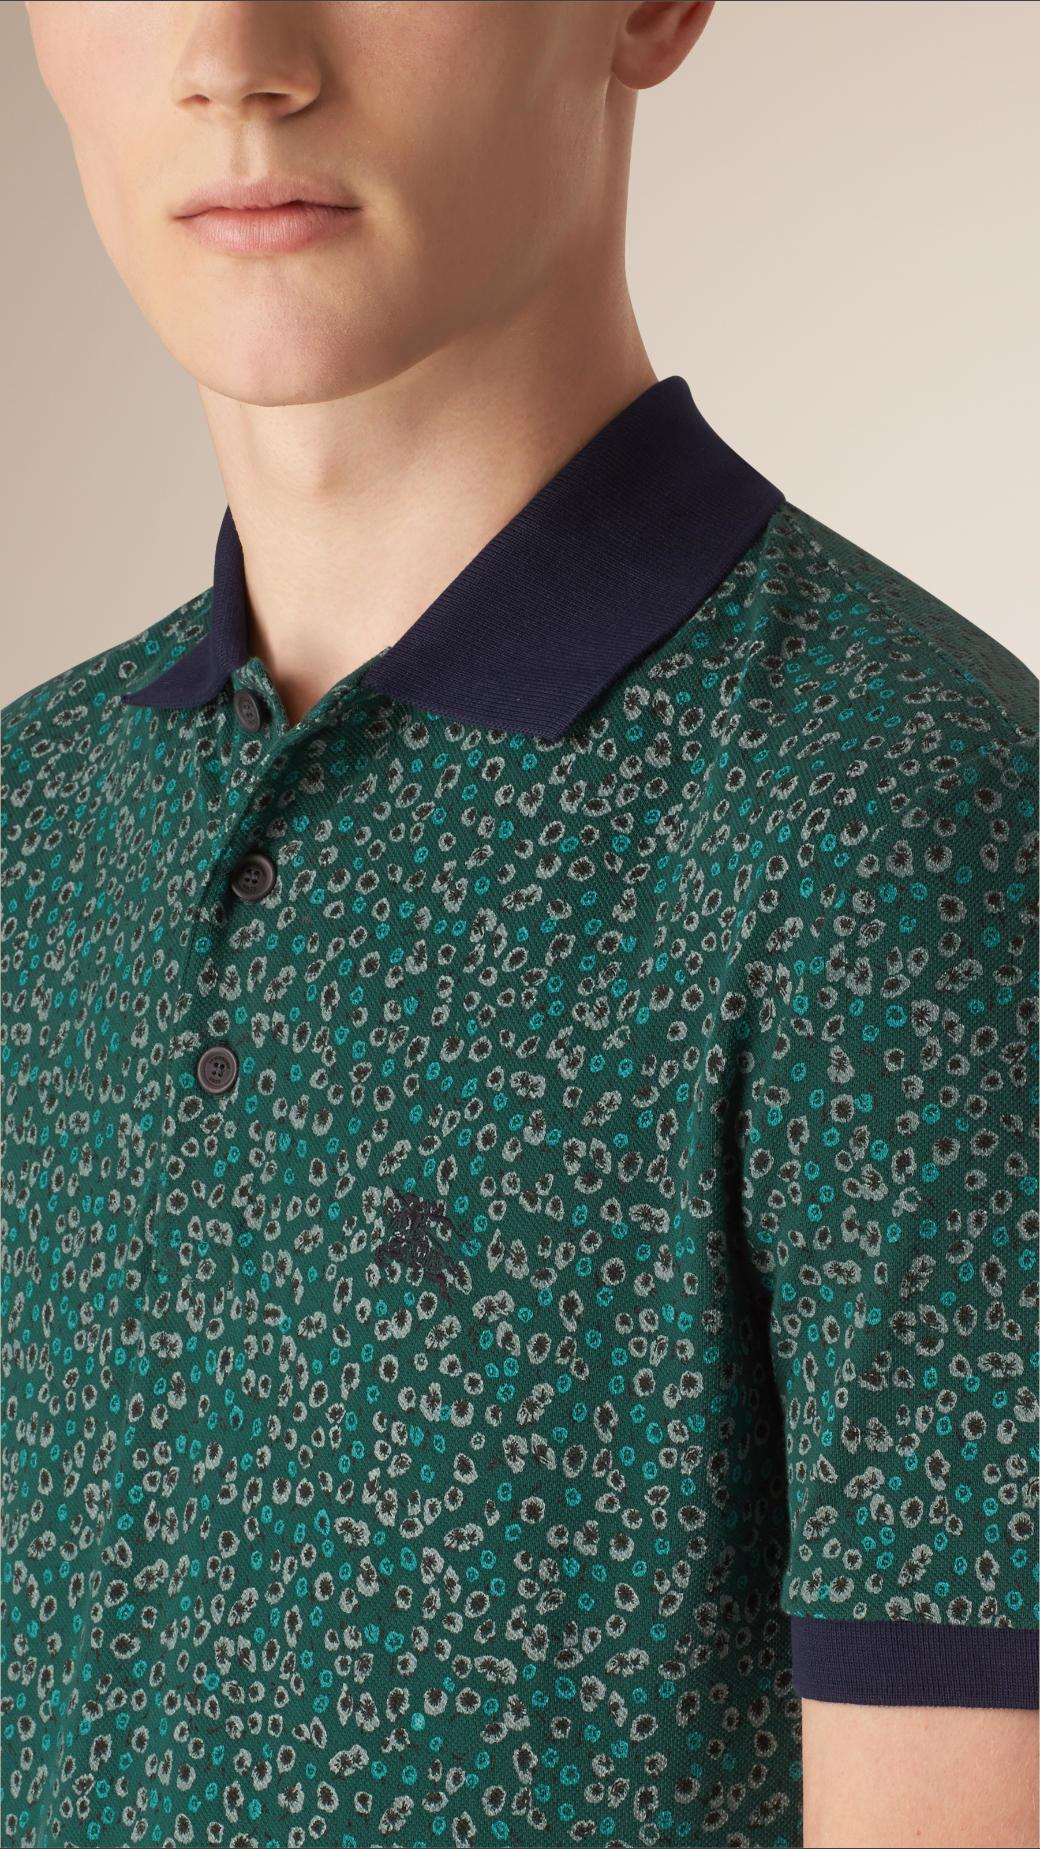 b89baa1cafe6a Burberry Abstract Print Piqué Cotton Polo Shirt Mineral Green in ...